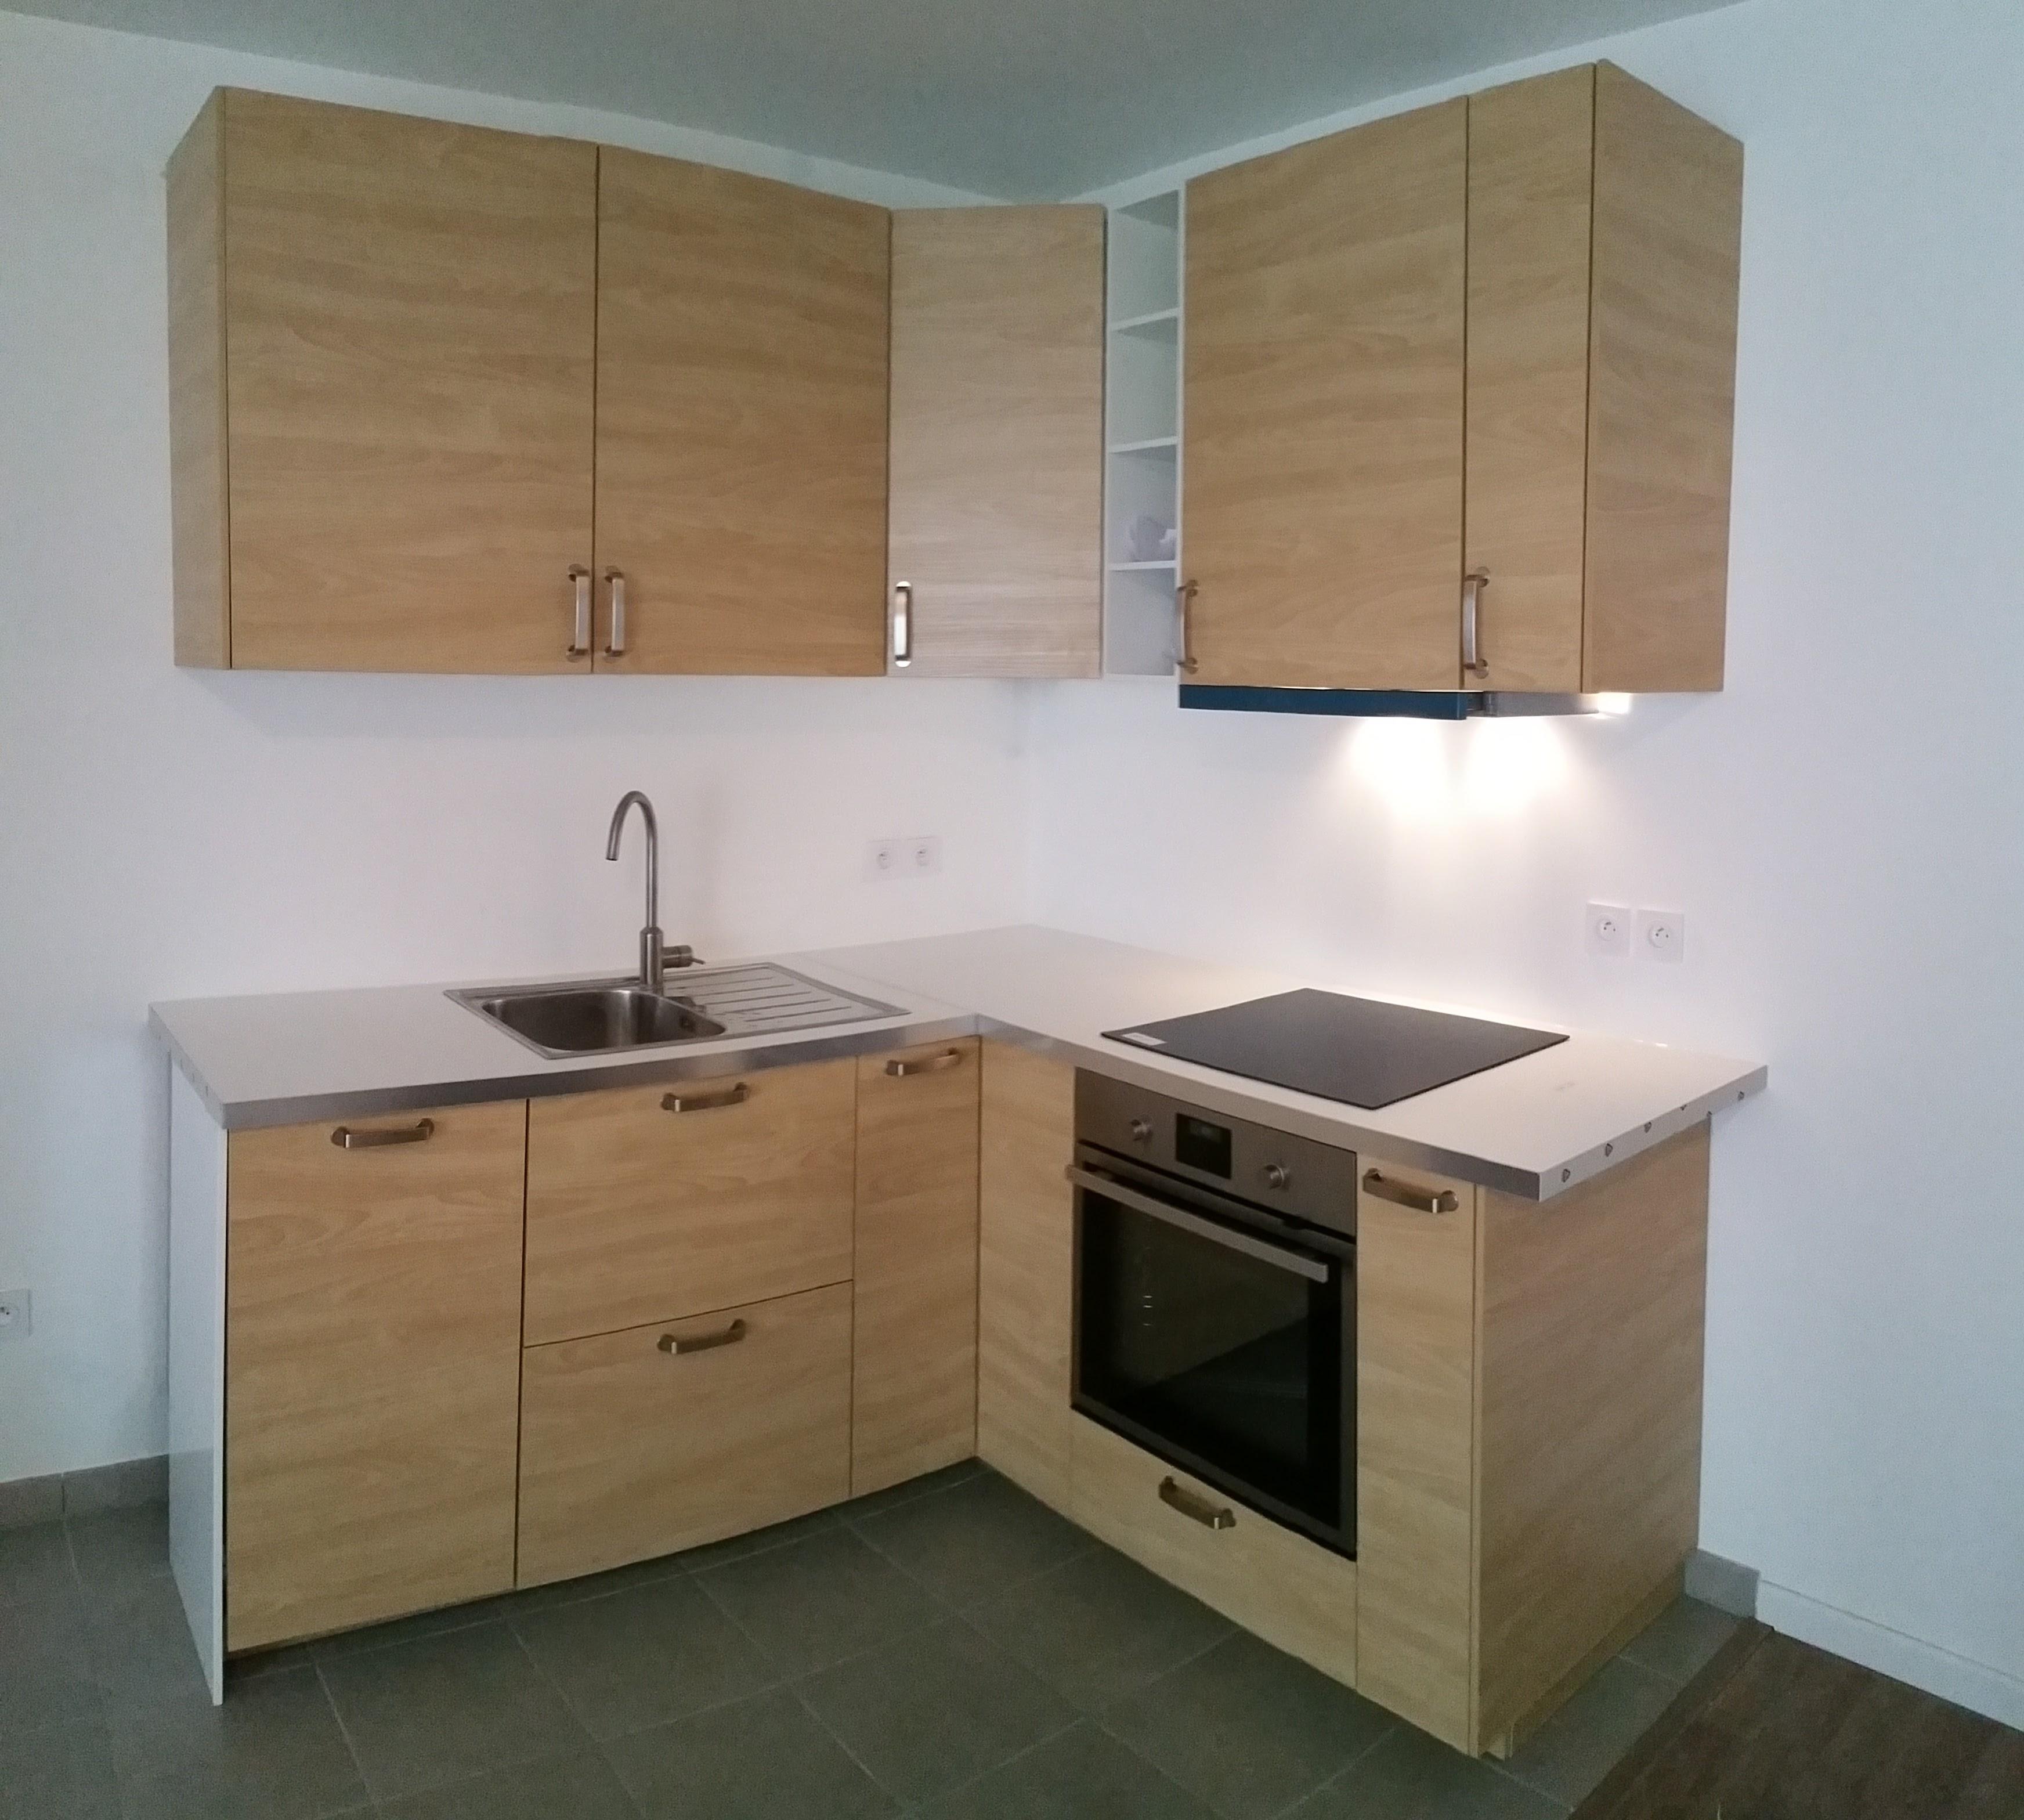 installateur de cuisine. Black Bedroom Furniture Sets. Home Design Ideas